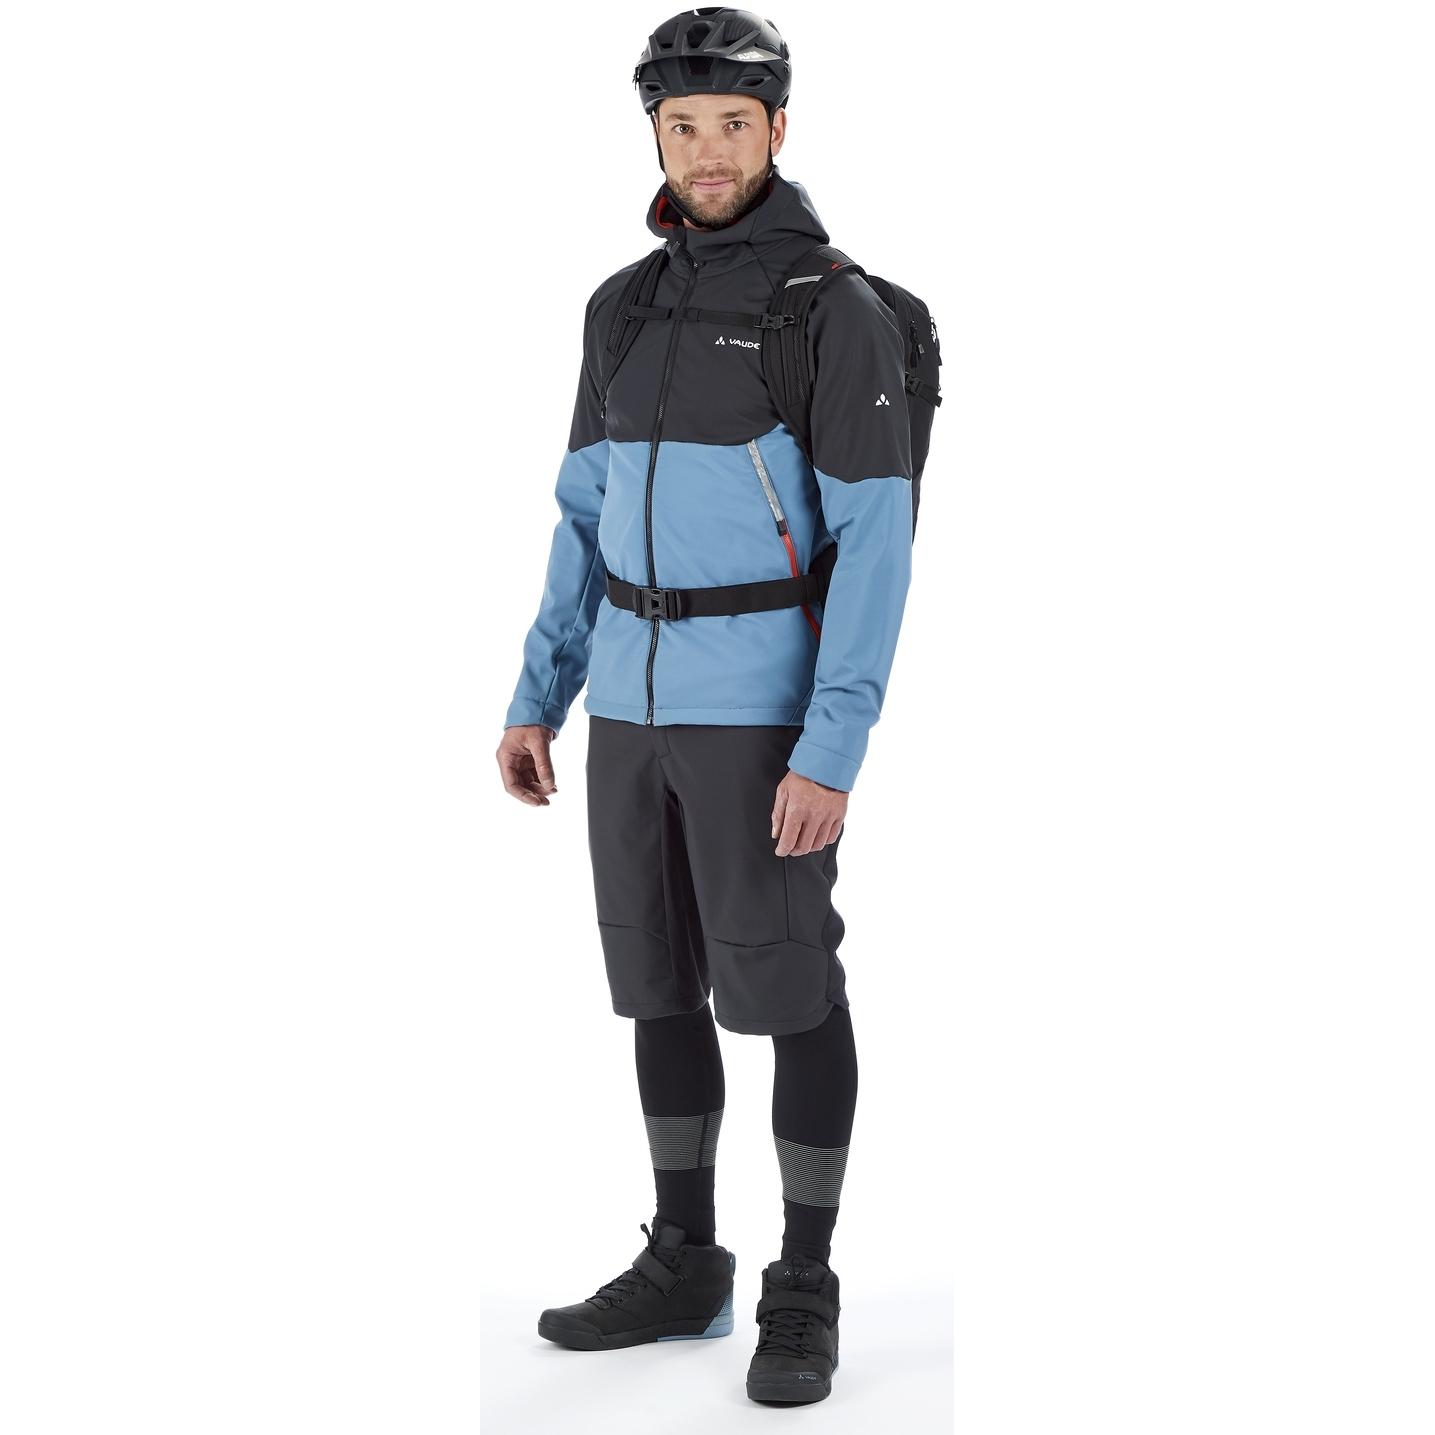 Image of Vaude Men's Qimsa Softshell Jacket - carmine